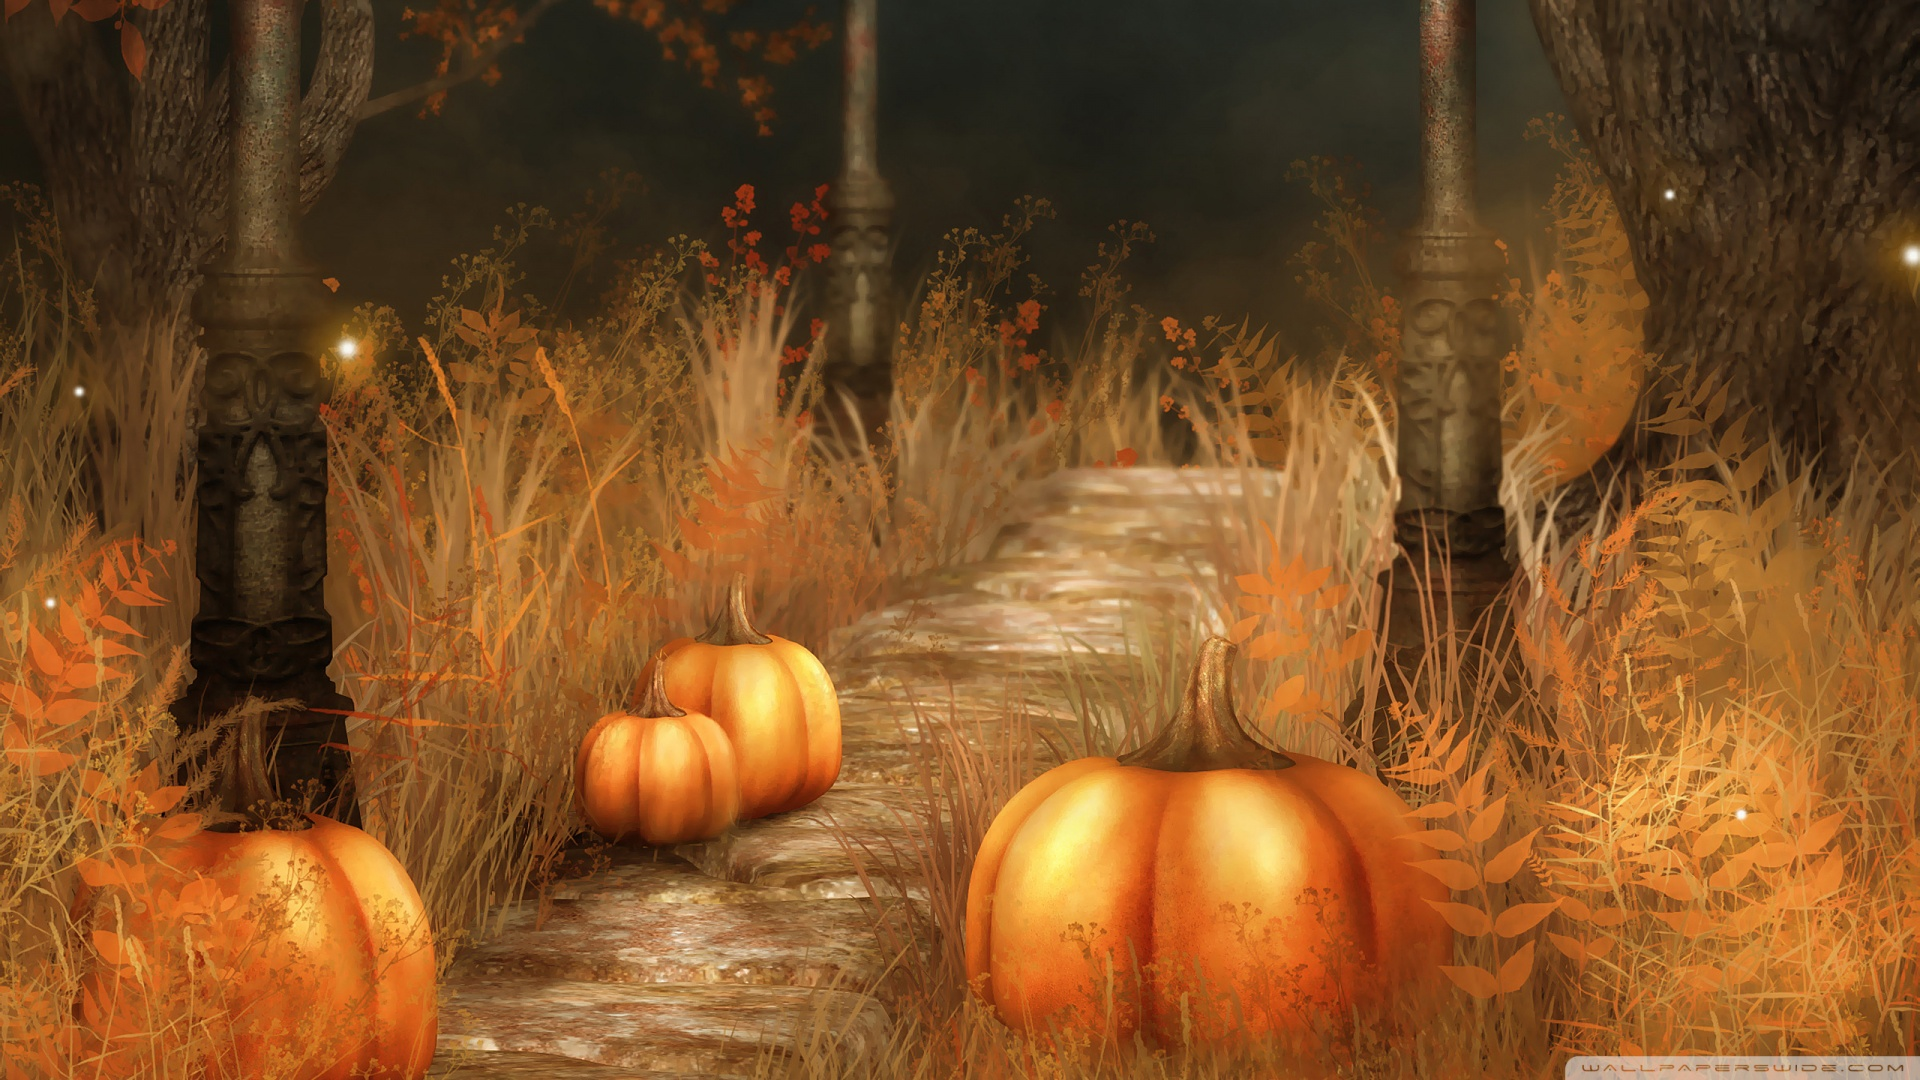 Pumpkins Halloween Wallpaper Download 1920x1080